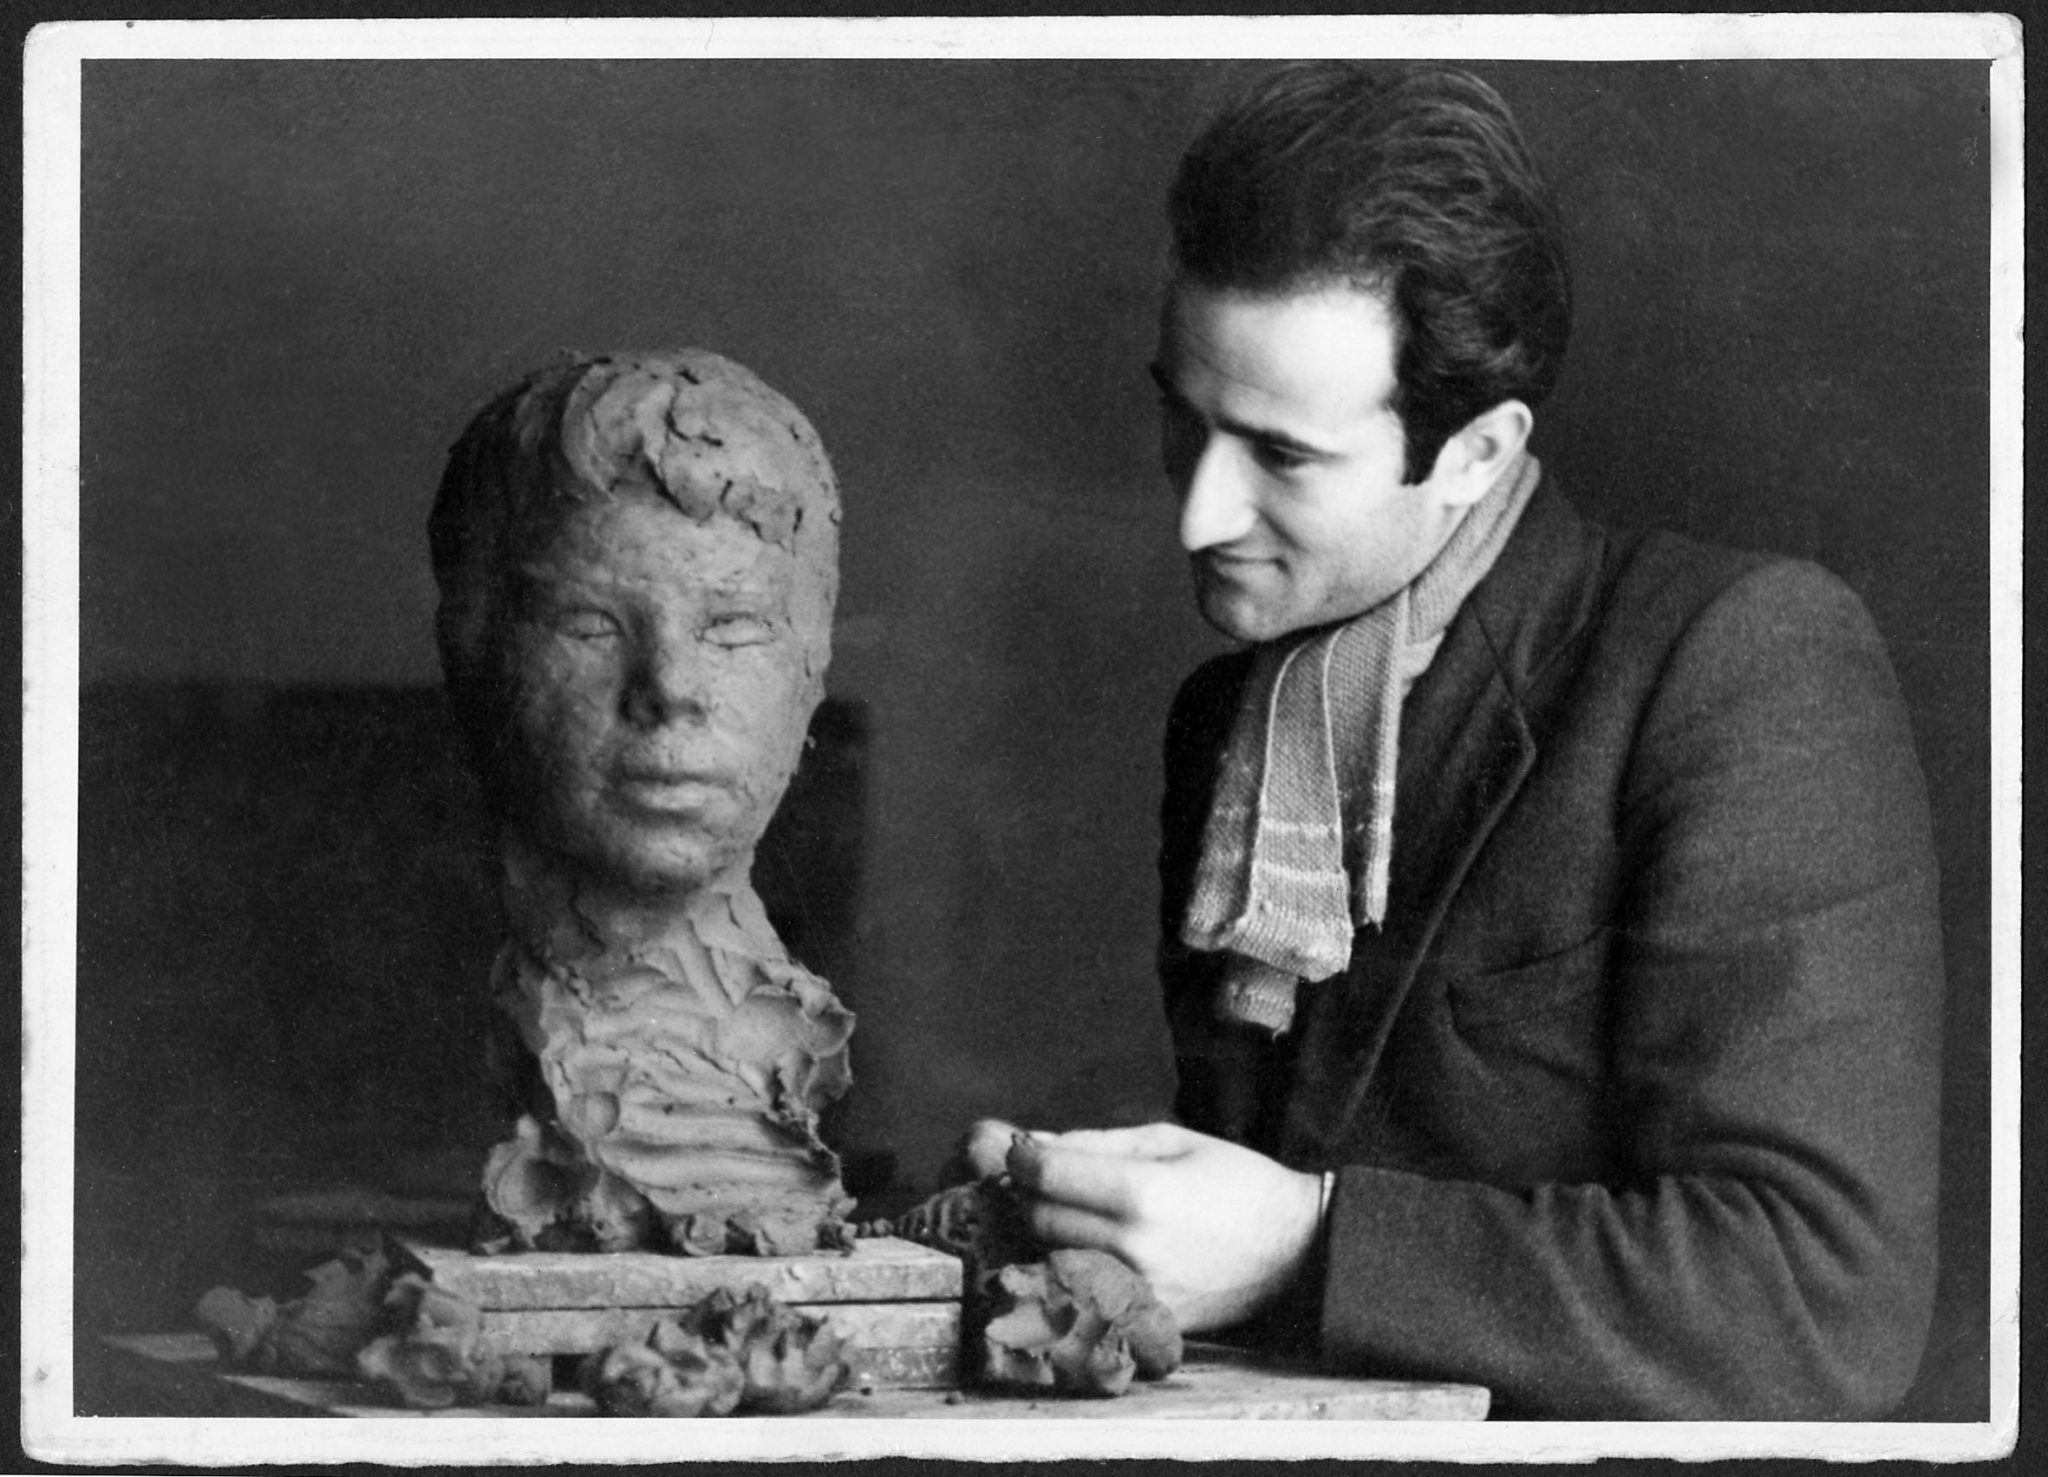 Pietro Consagra Studente a Palermo, 1940